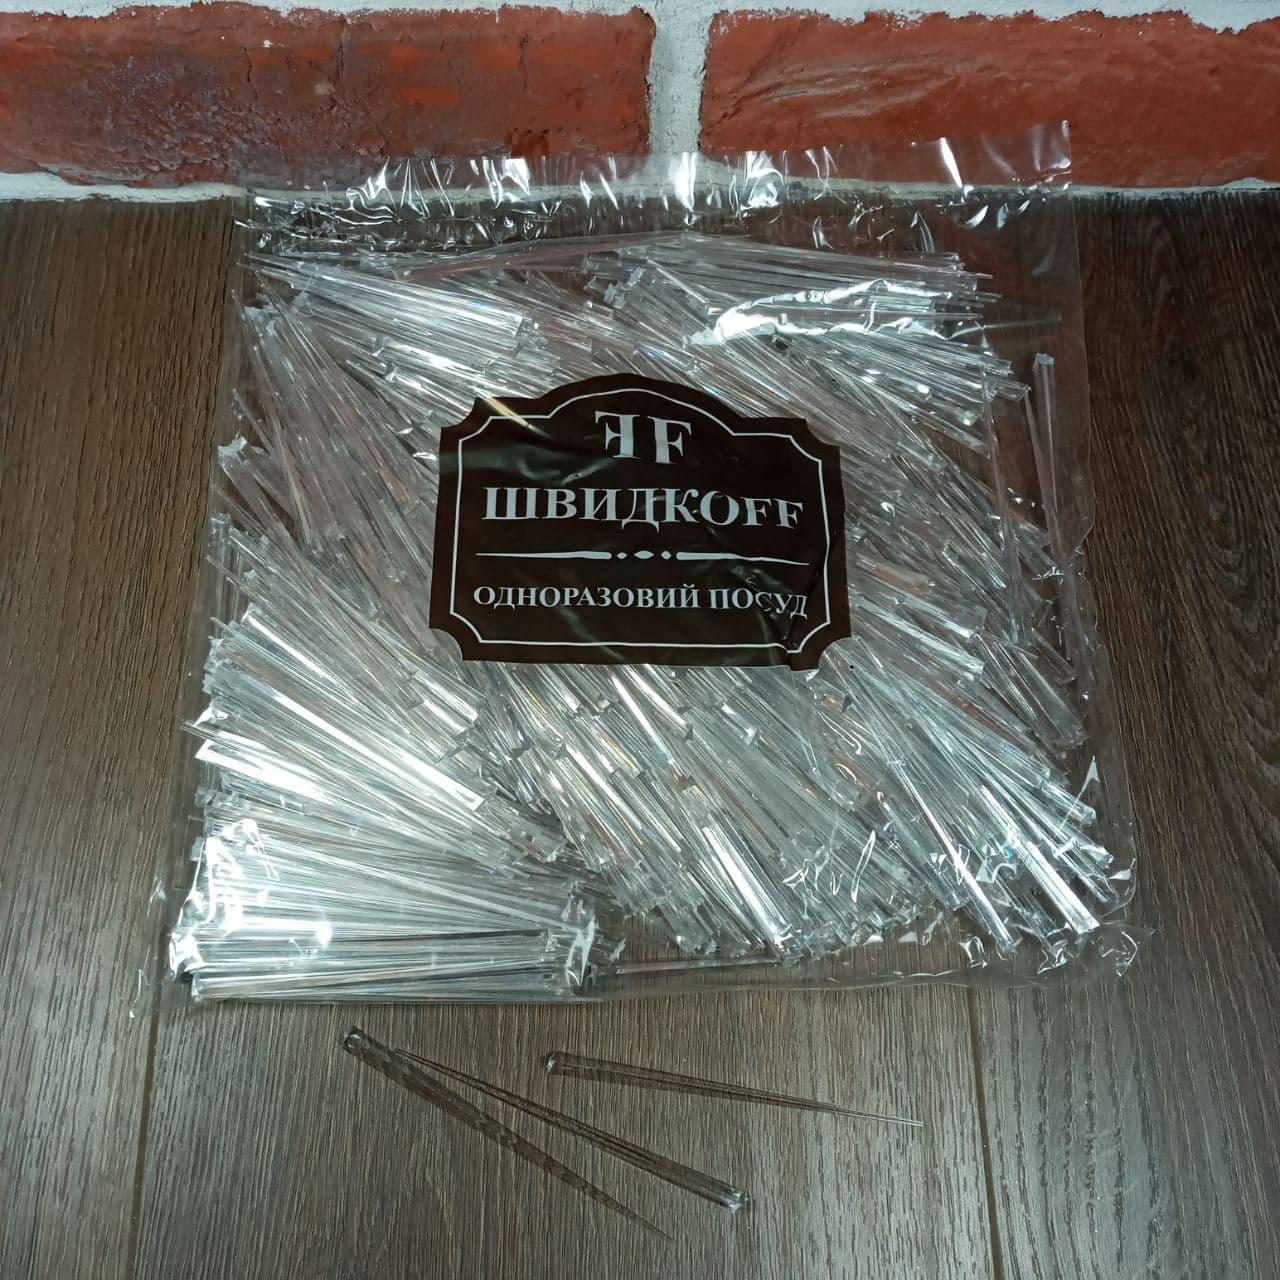 Шпажка для канапе Кристалл 500шт. прозрачный